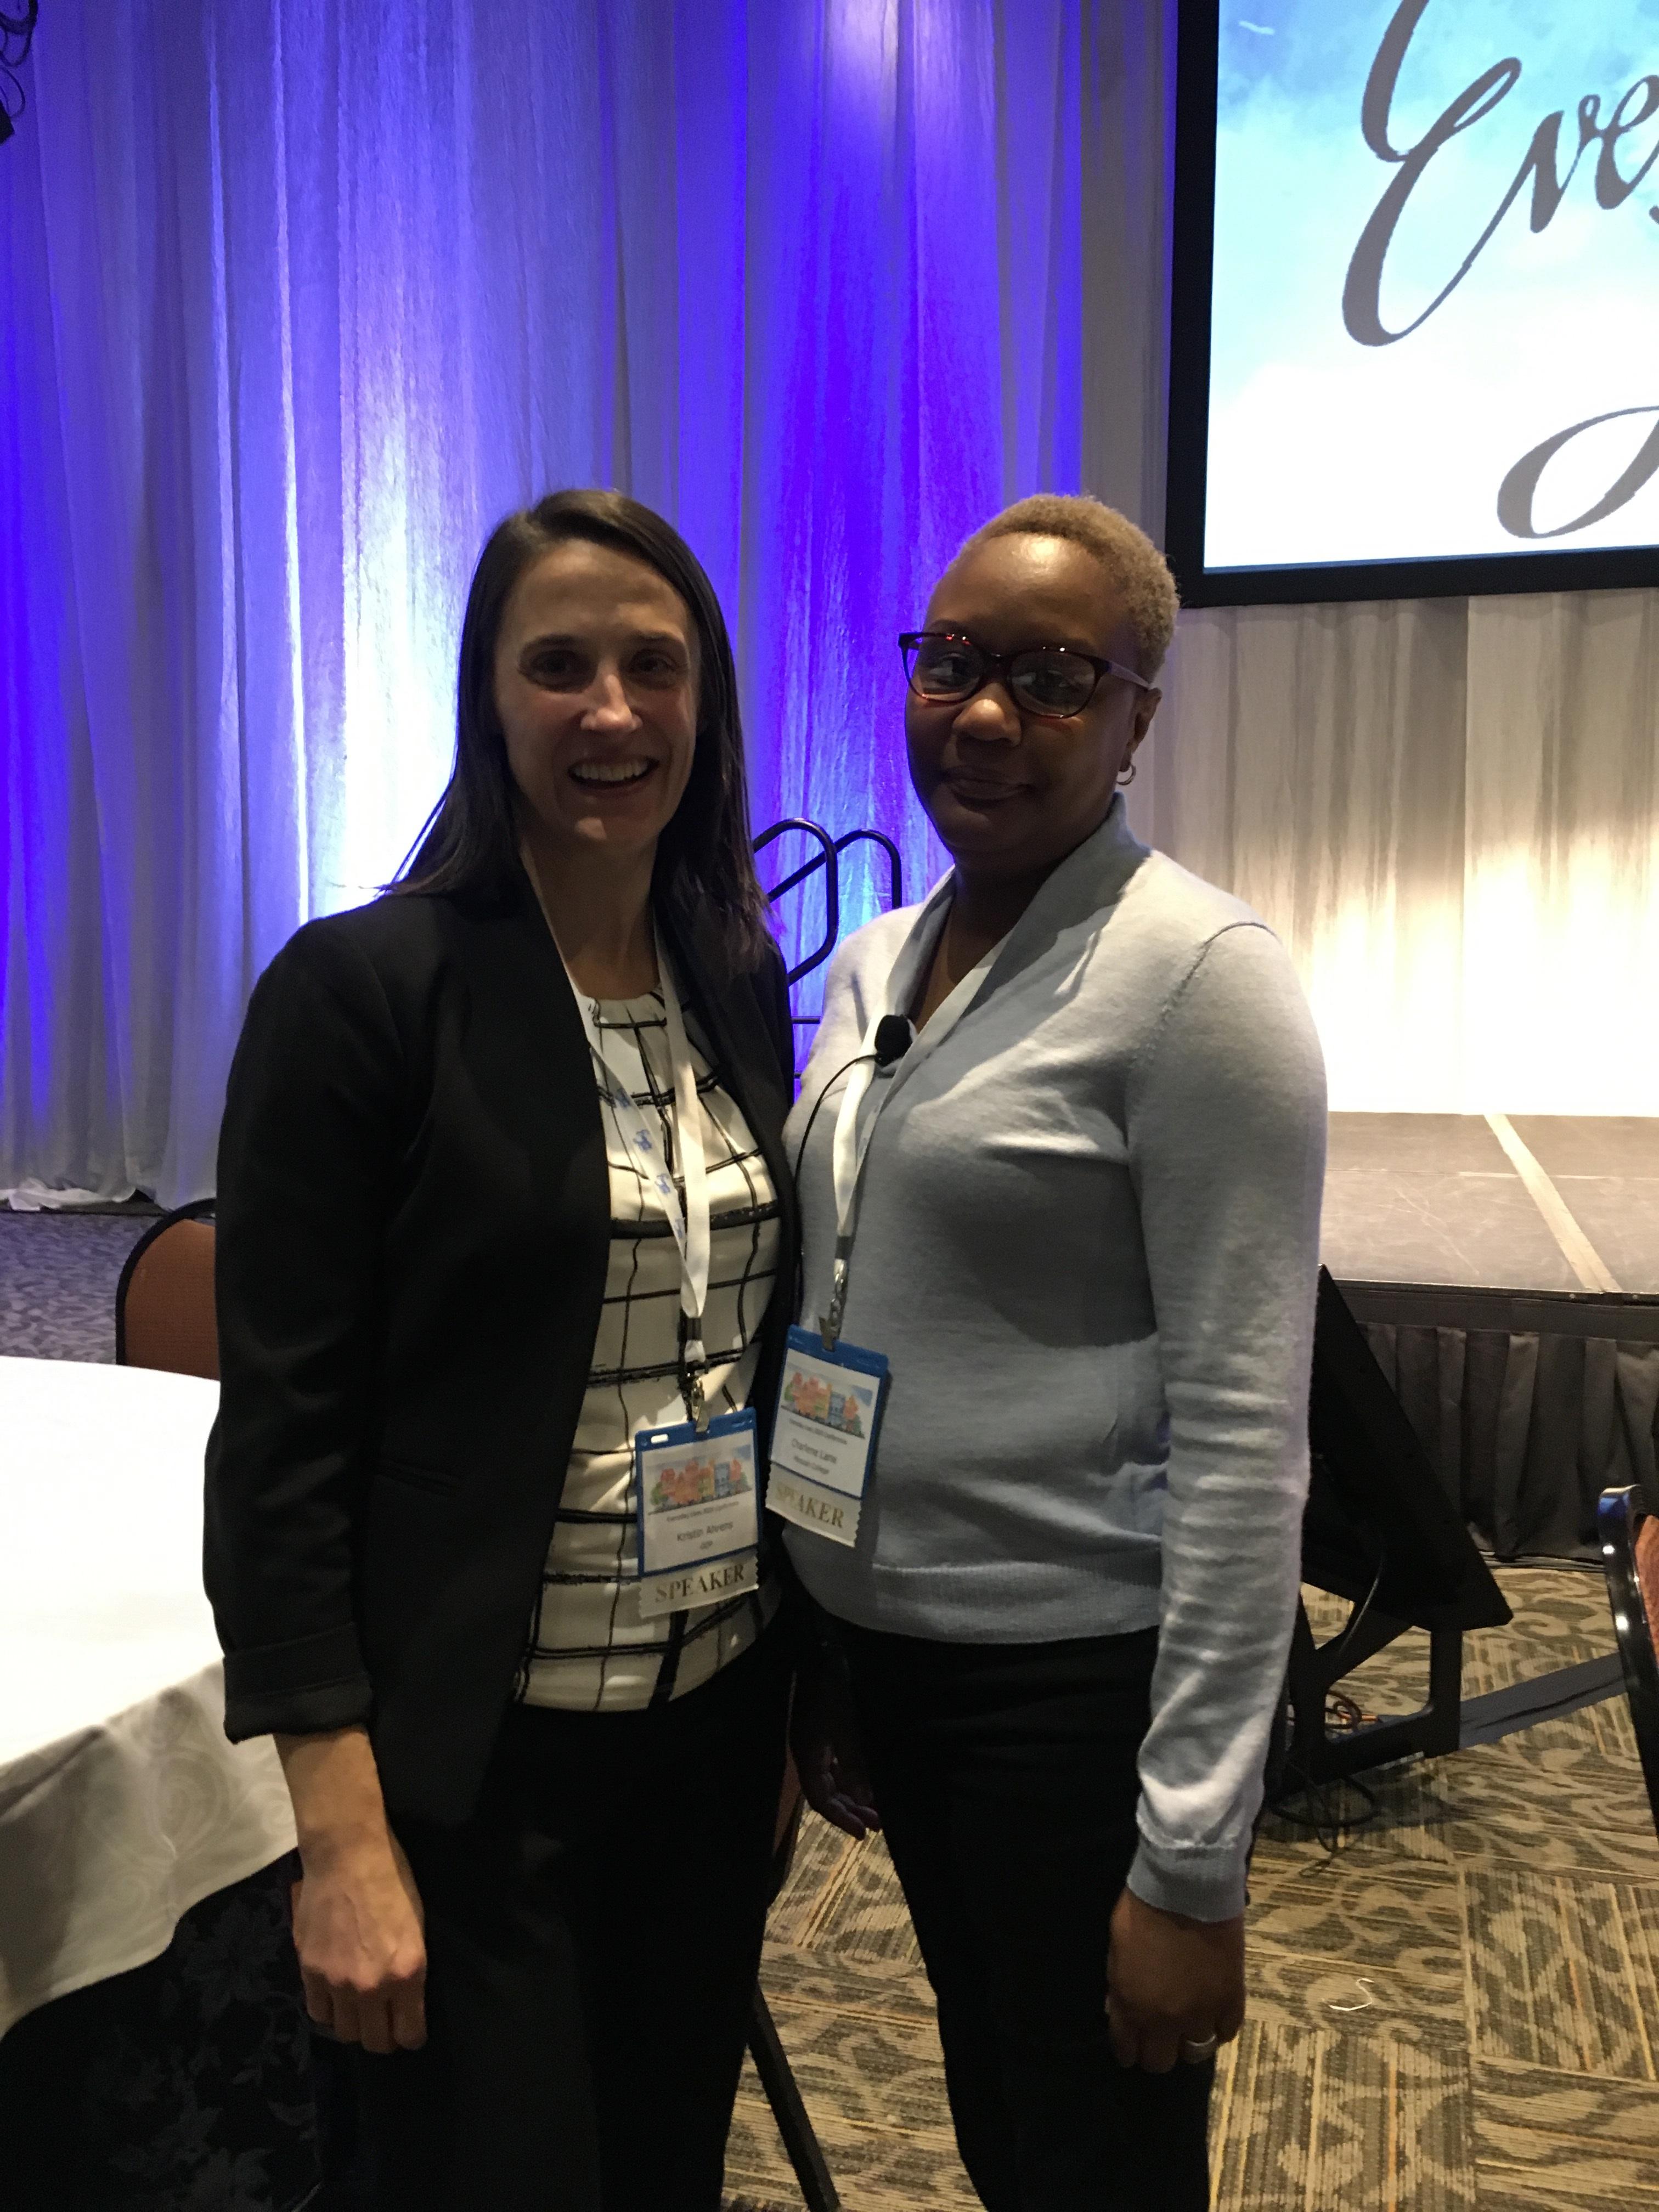 ODP Deputy Secretary Kristin Ahrens and Dr. Charlene Lane